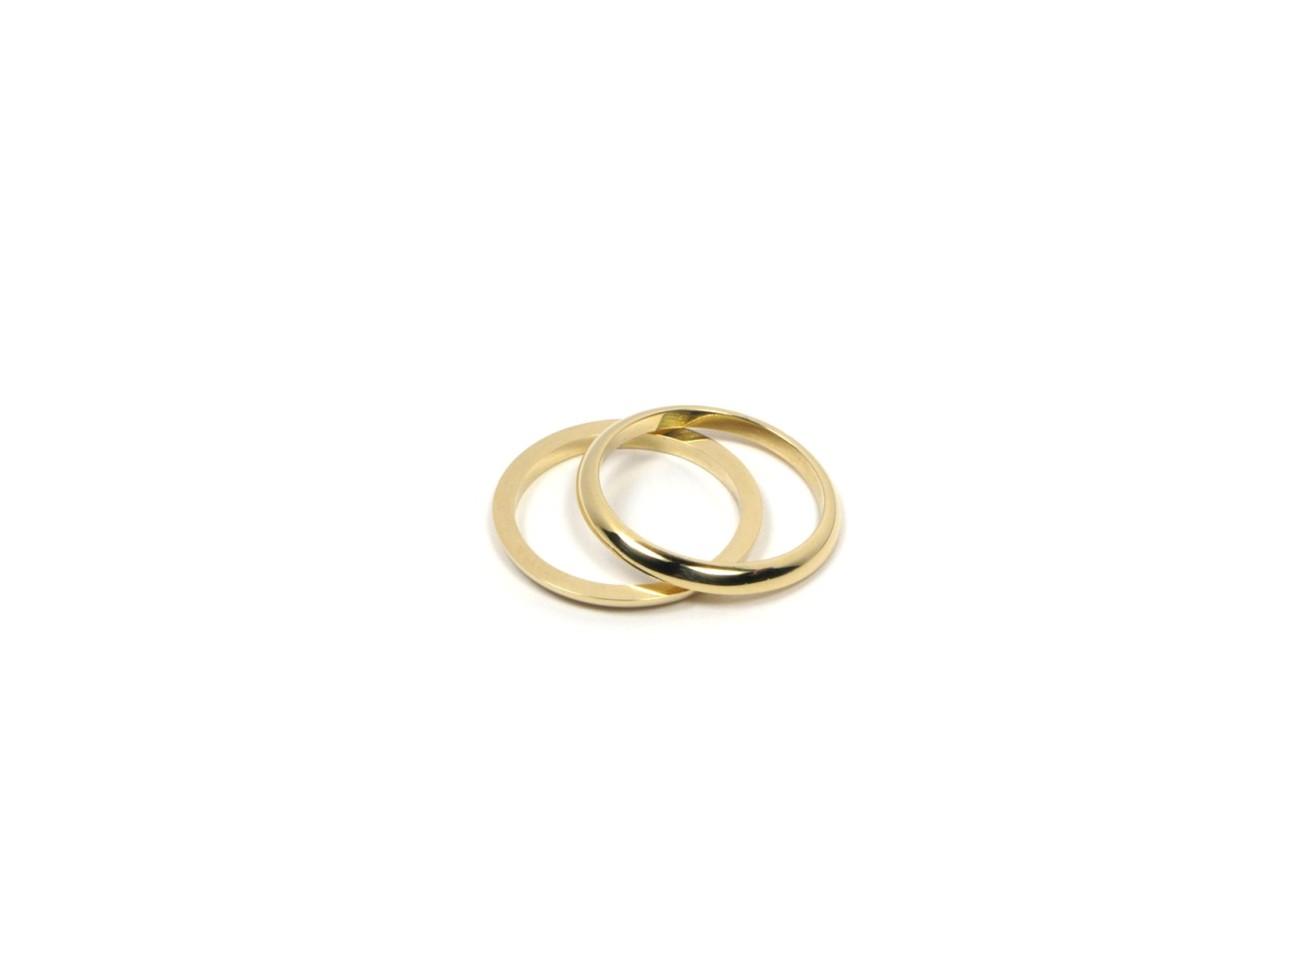 Marc Monzo, Half Wedding Ring, 2013